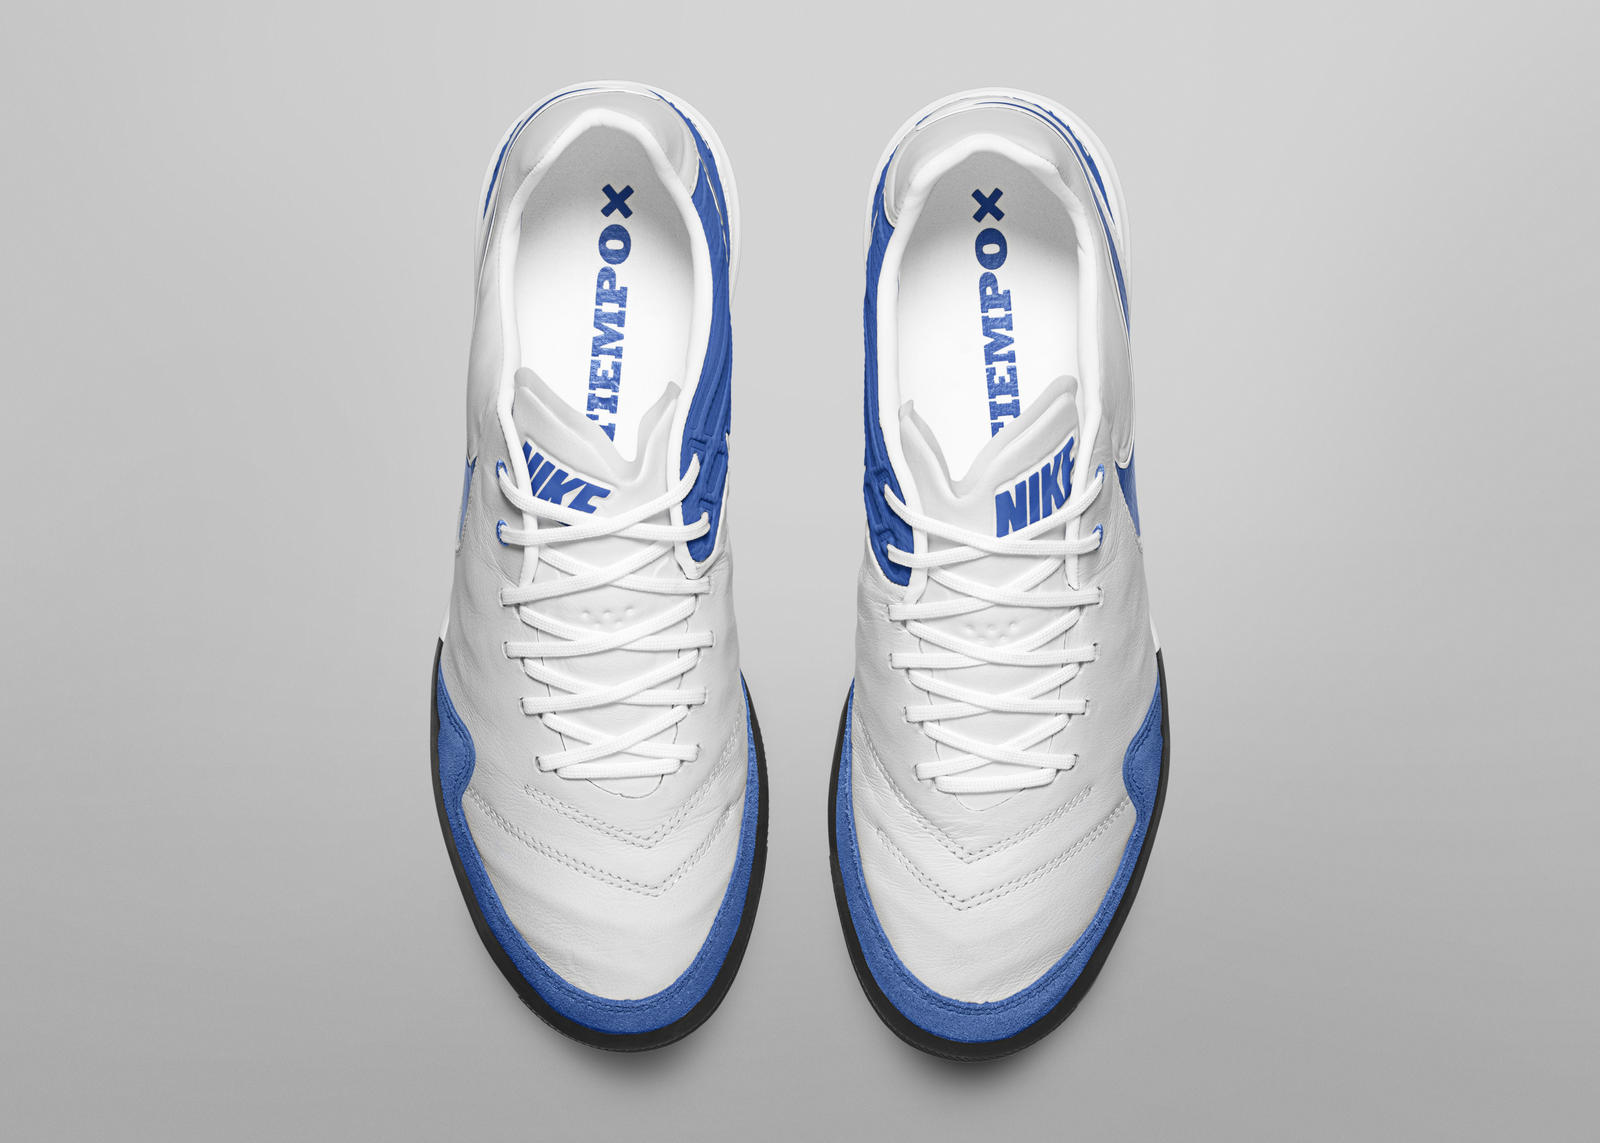 3abc61506c8 NikeFootballX Heritage Pack - Nike News